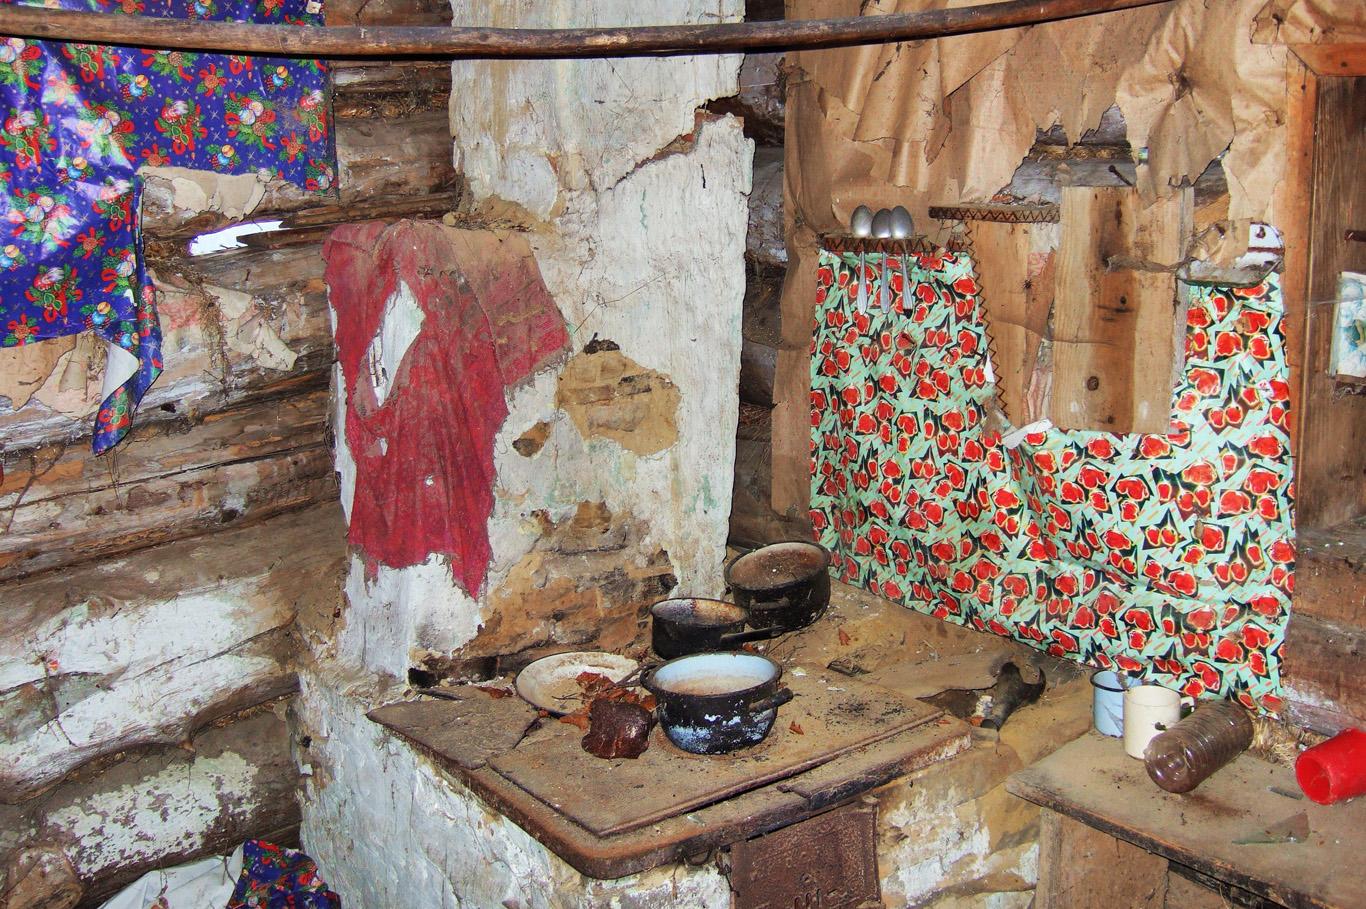 The cottage inside